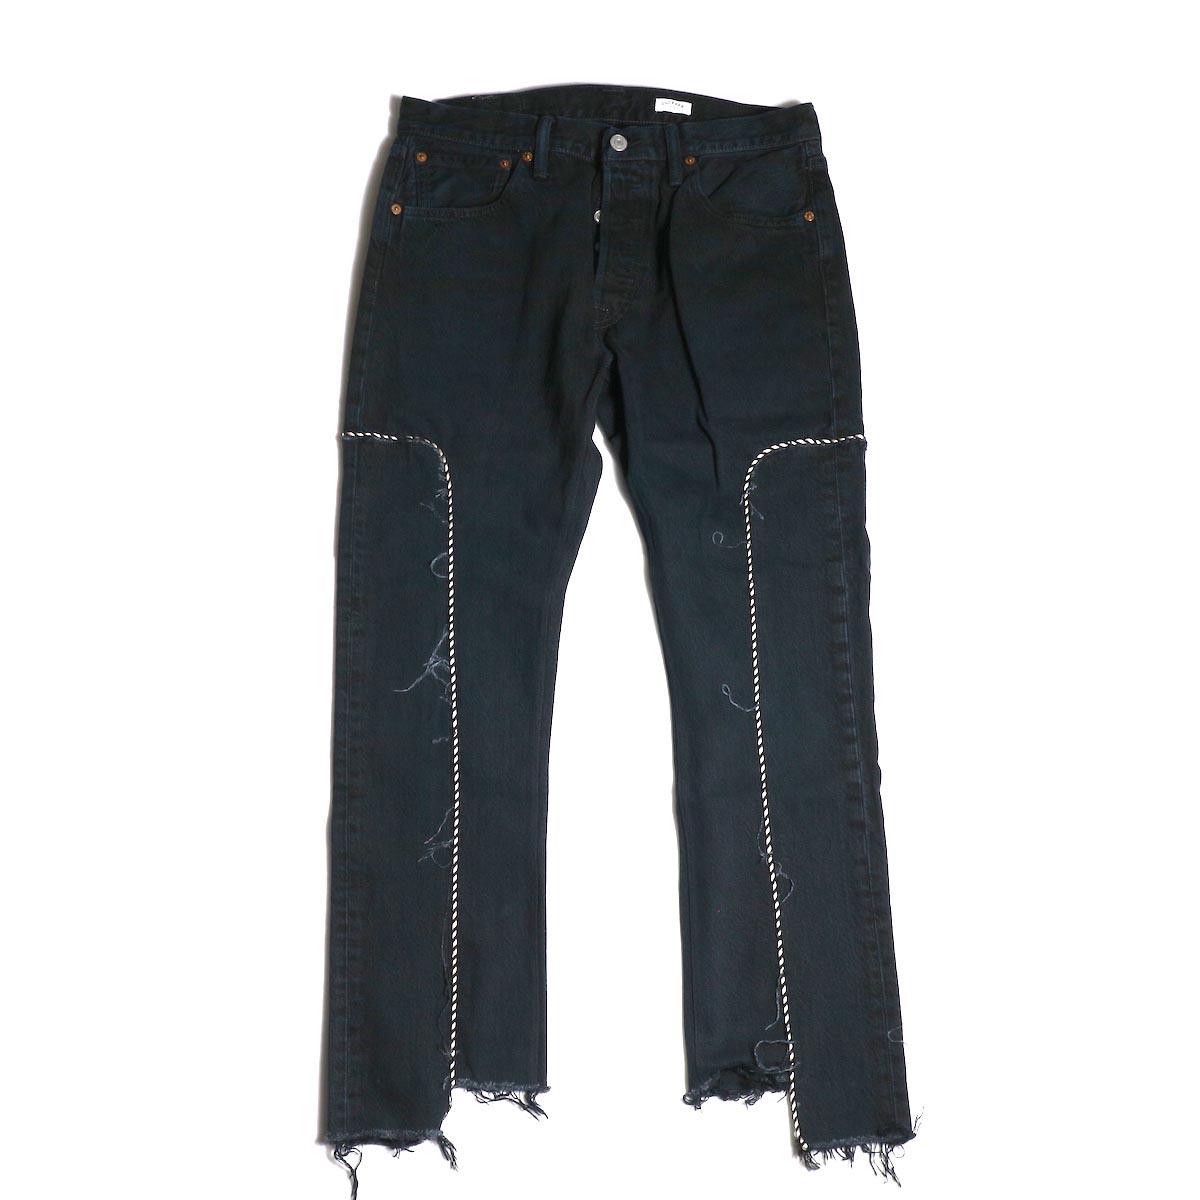 OLD PARK / Western Jeans (Black) (Msize-A)